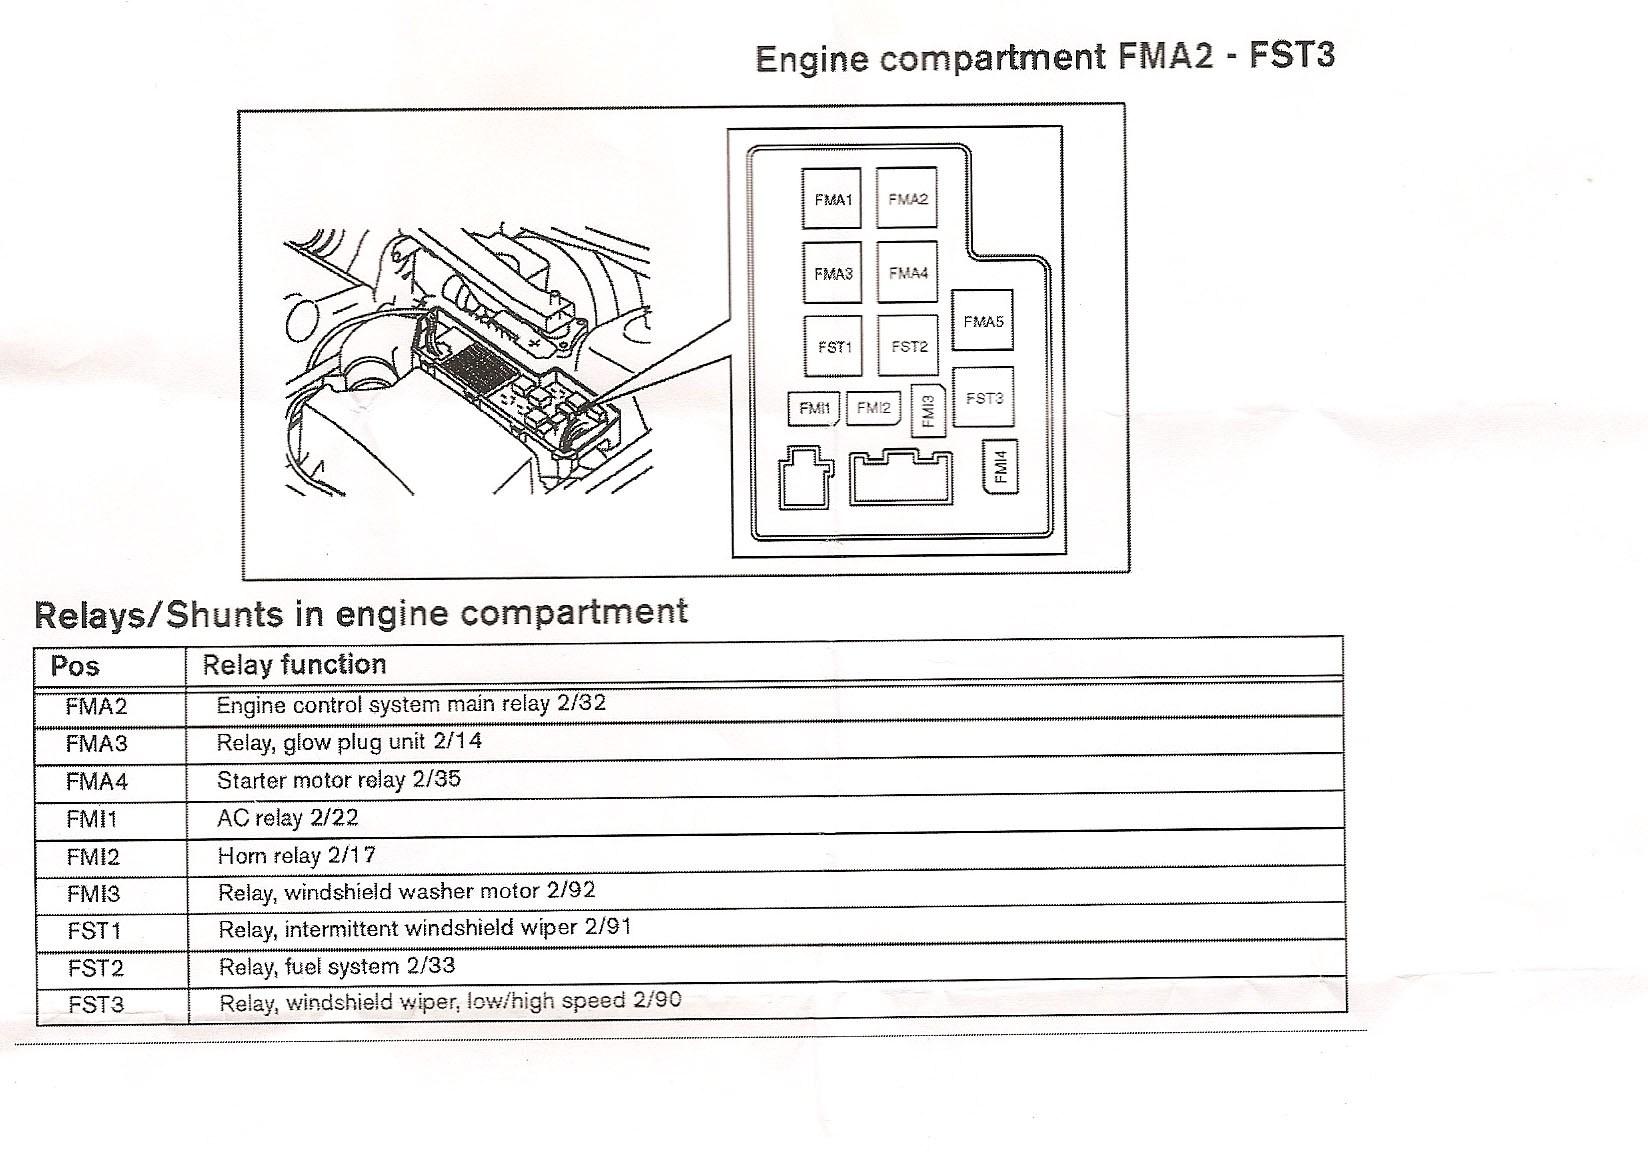 volvo wiring diagram xc70 2010 volvo xc70 fuse diagram e2 wiring diagram volvo xc70 2006 wiring diagram 2010 volvo xc70 fuse diagram e2